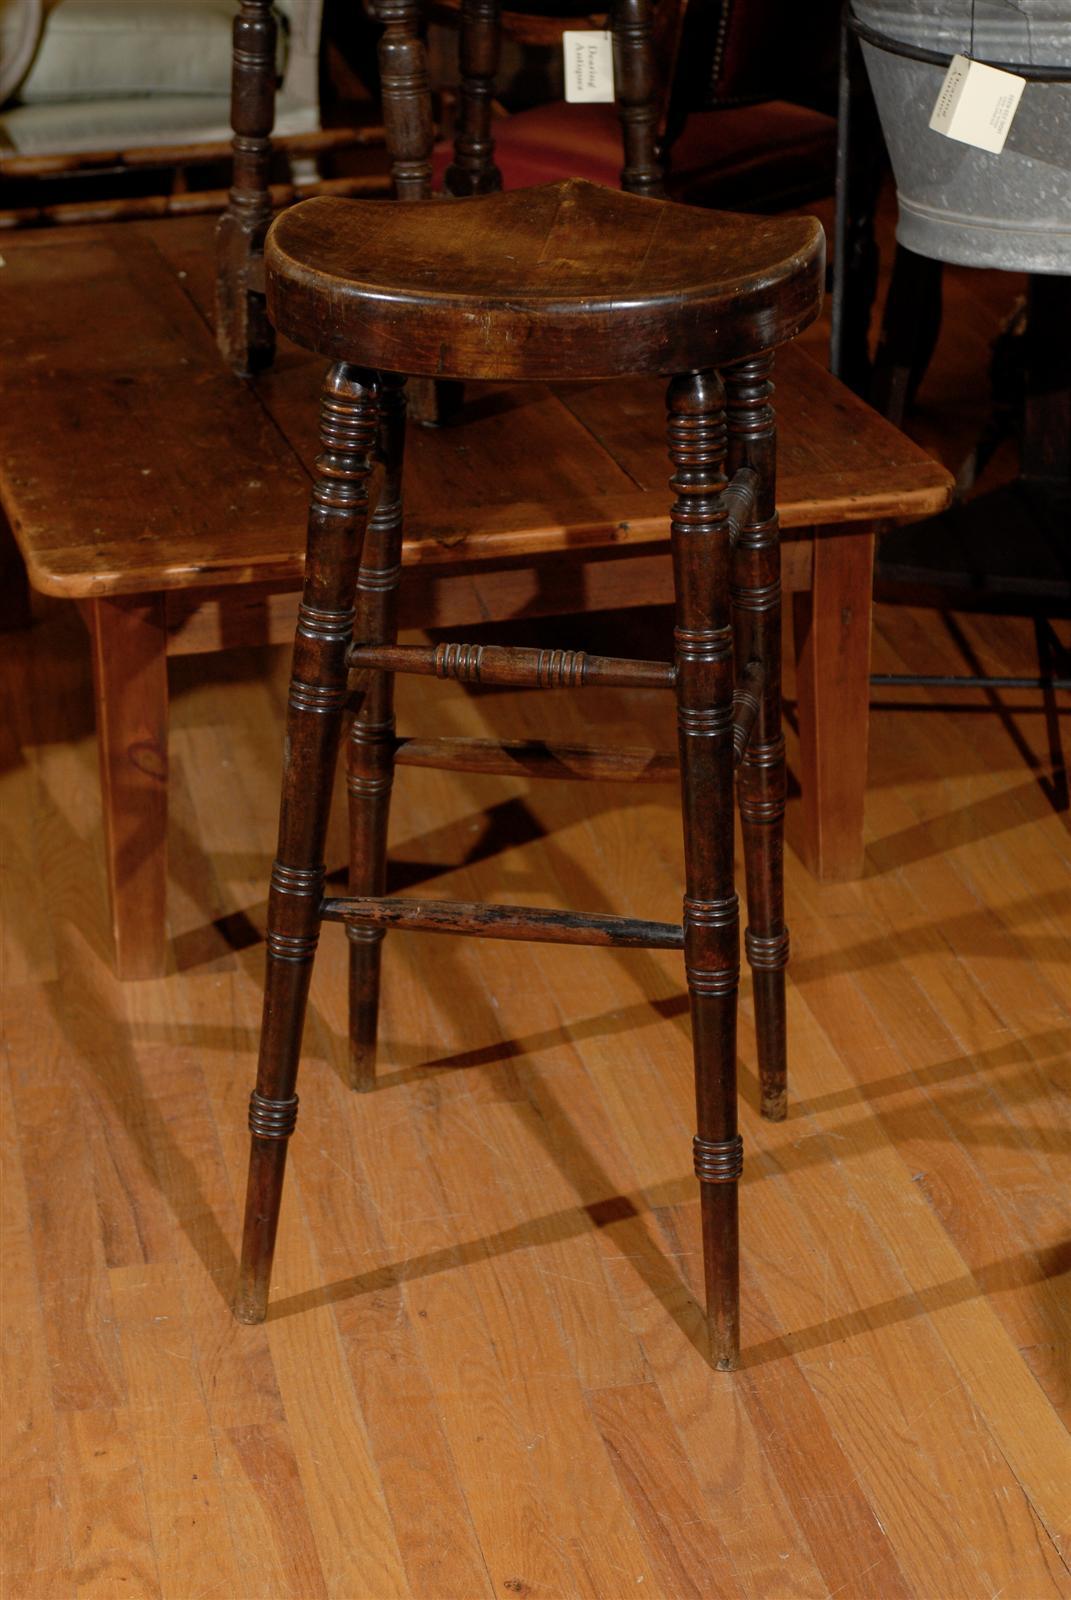 English Bar Stool With A Saddle Shaped Seat At 1stdibs